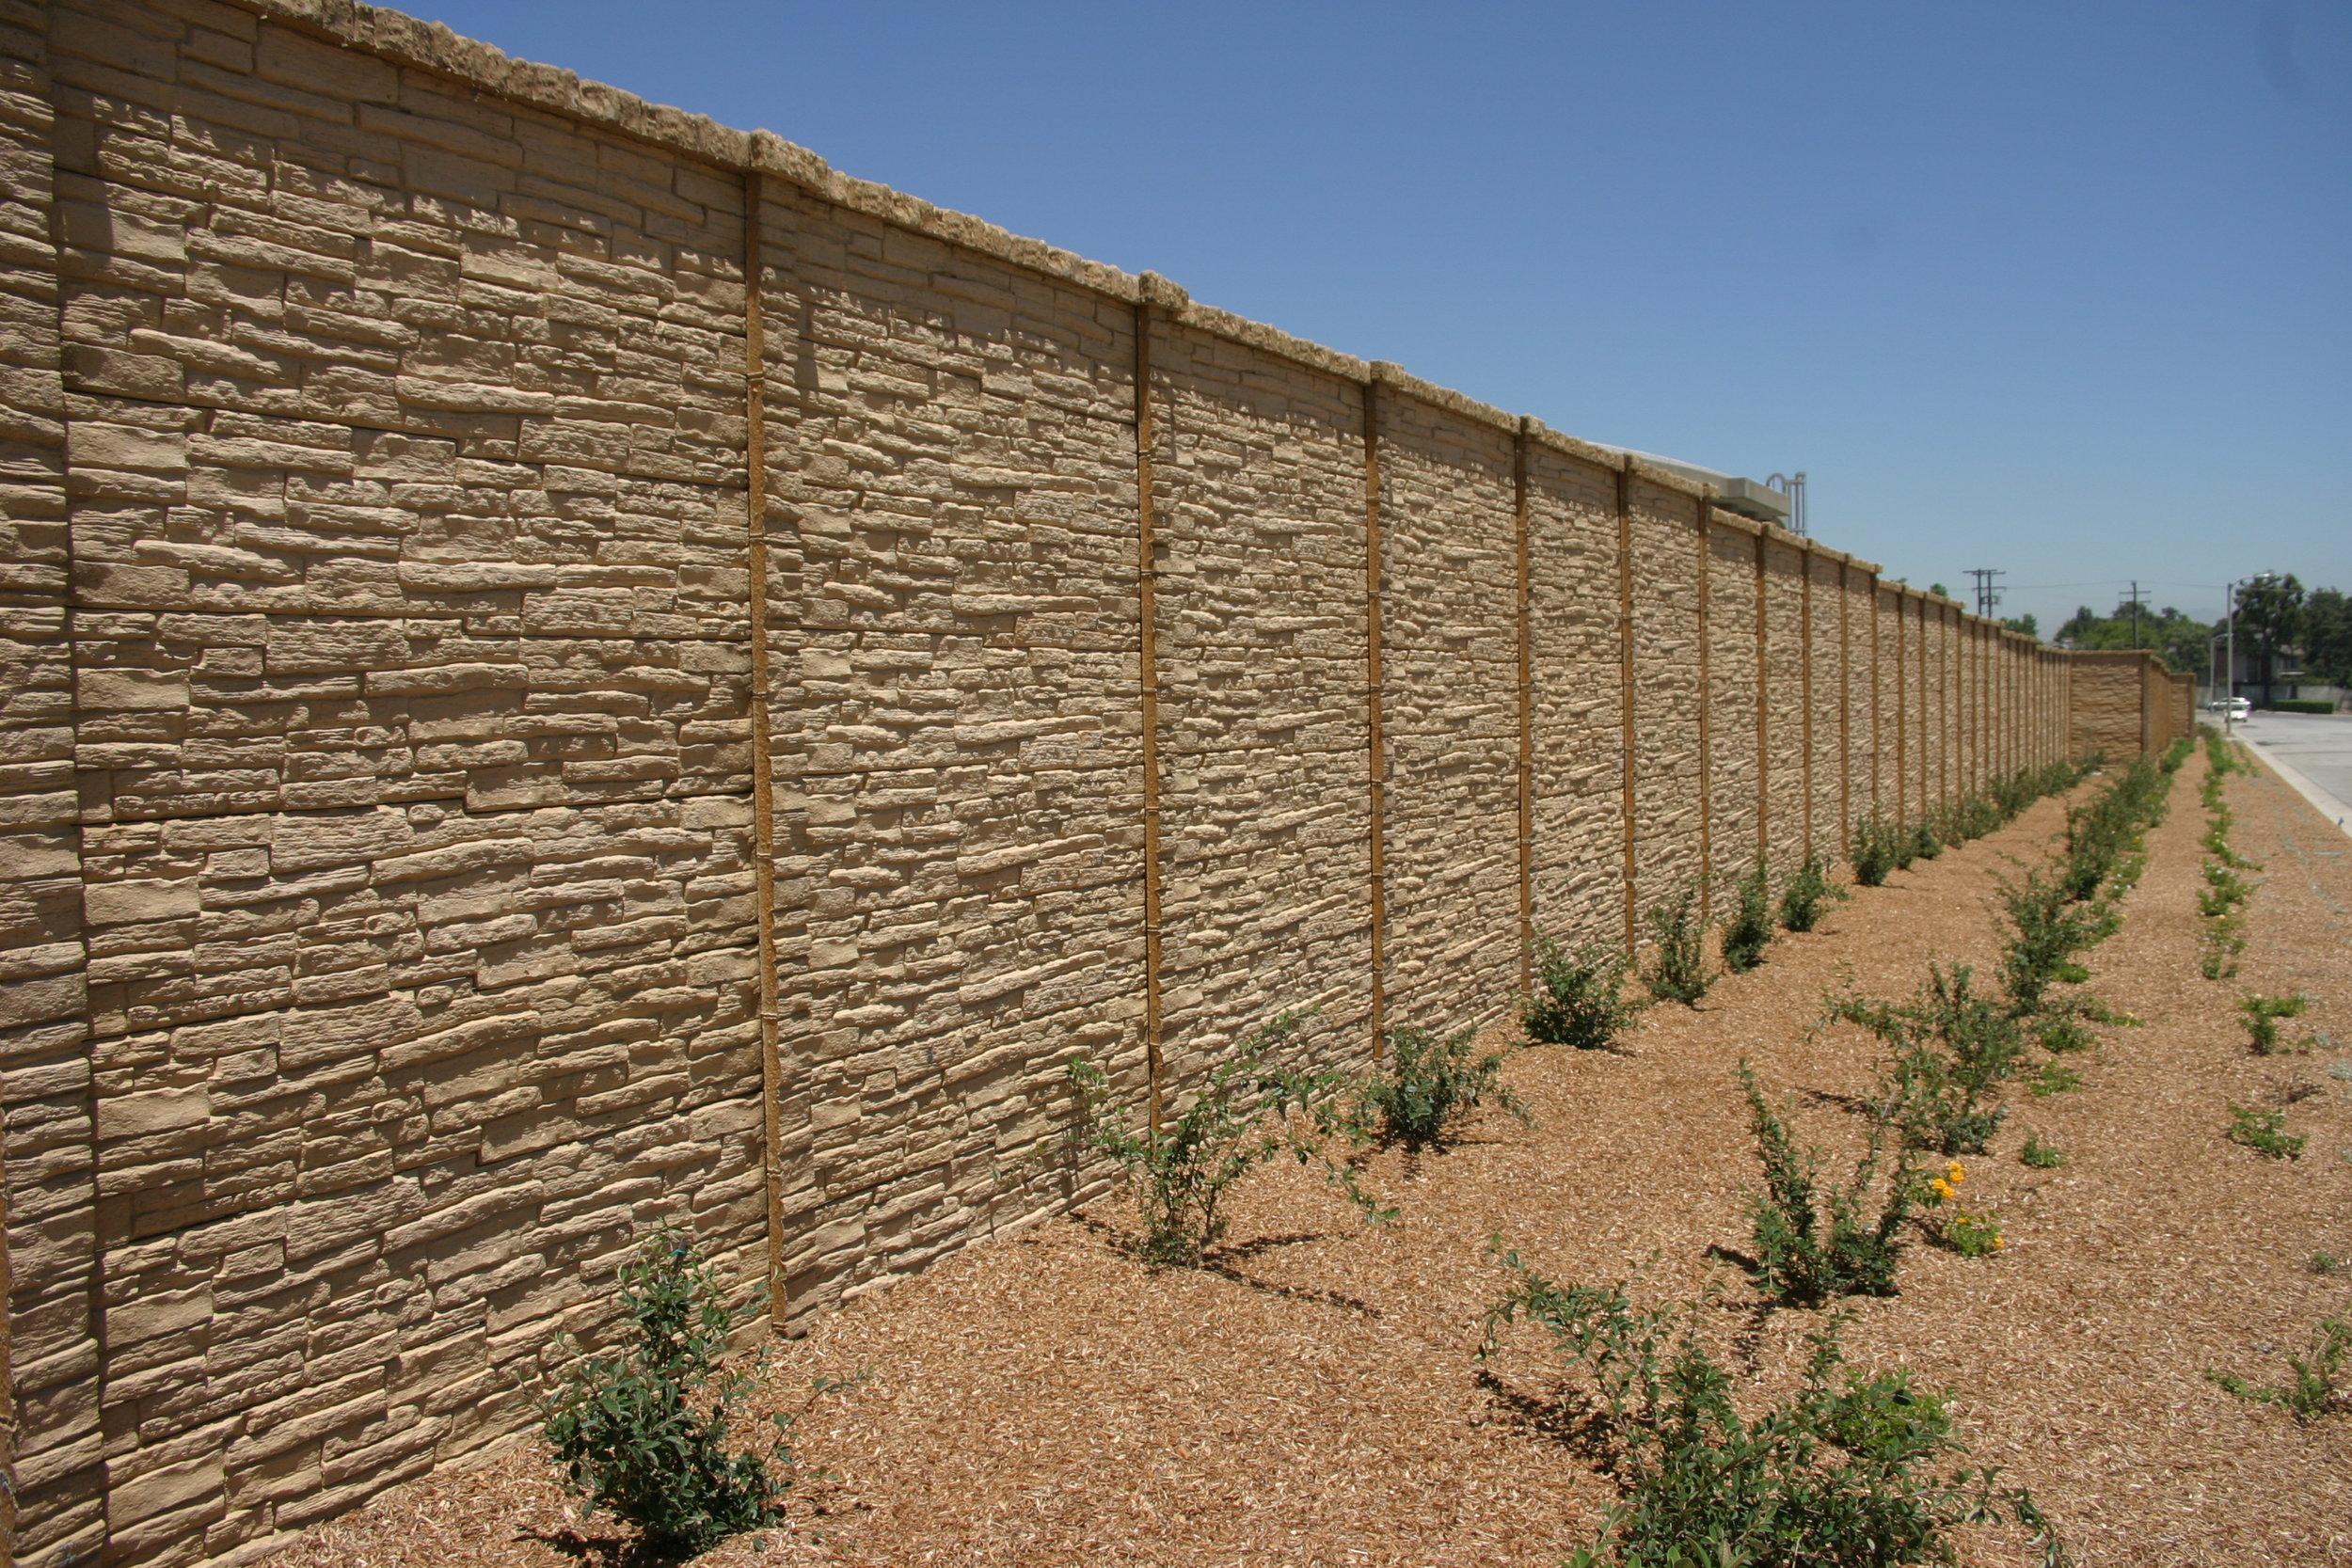 Preacst Concrete Fence StackedStone.JPG